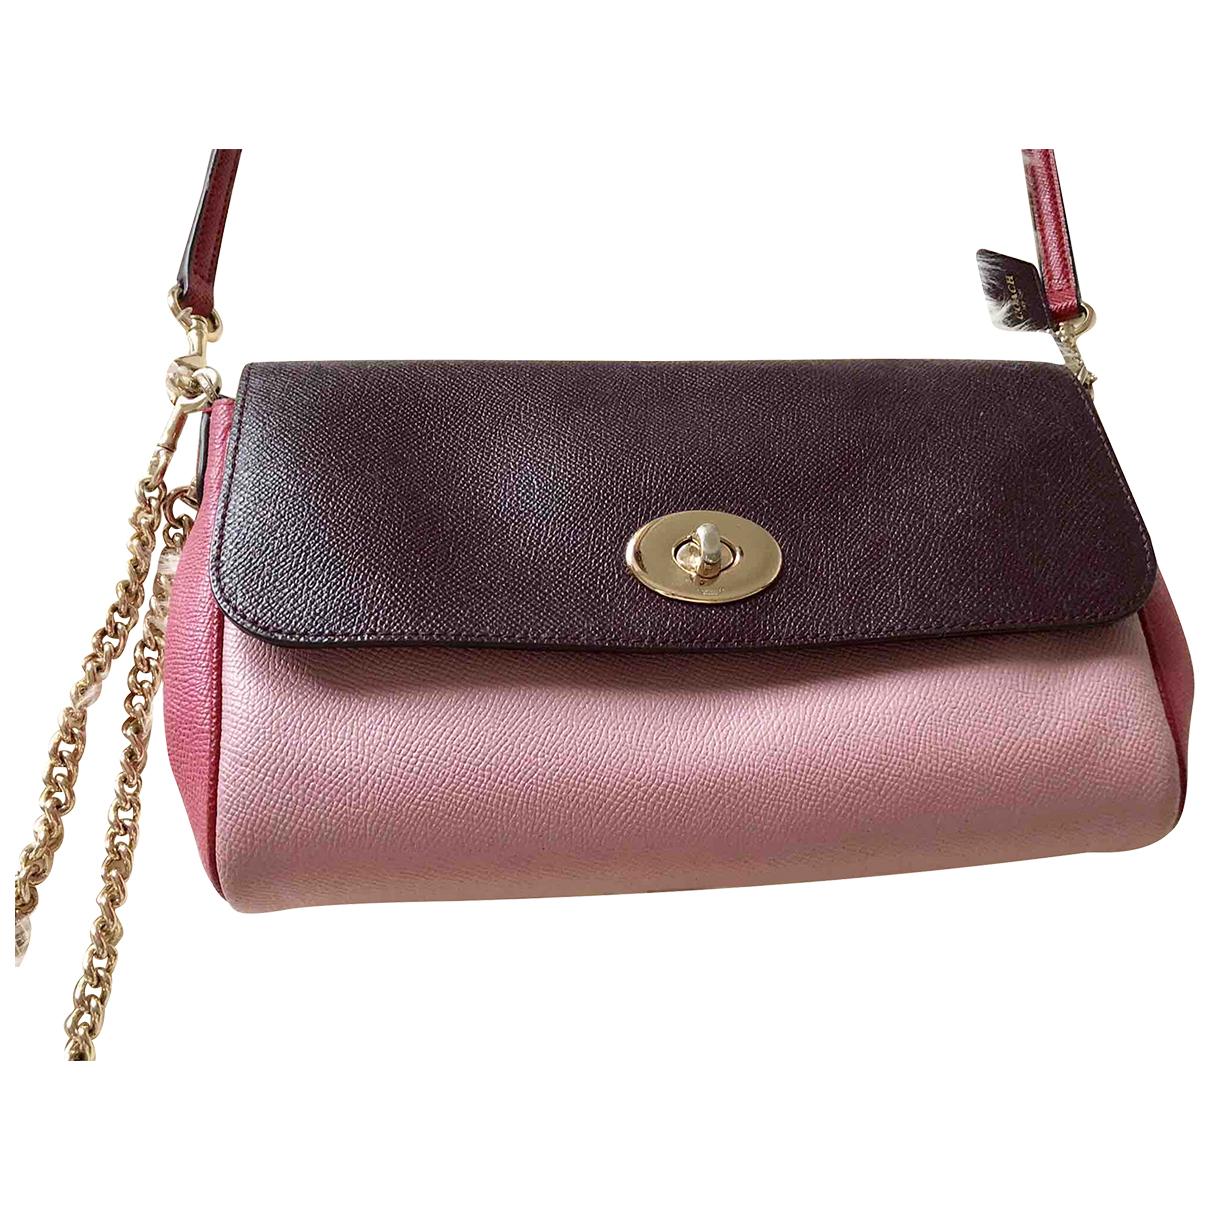 Coach N Multicolour Leather handbag for Women N